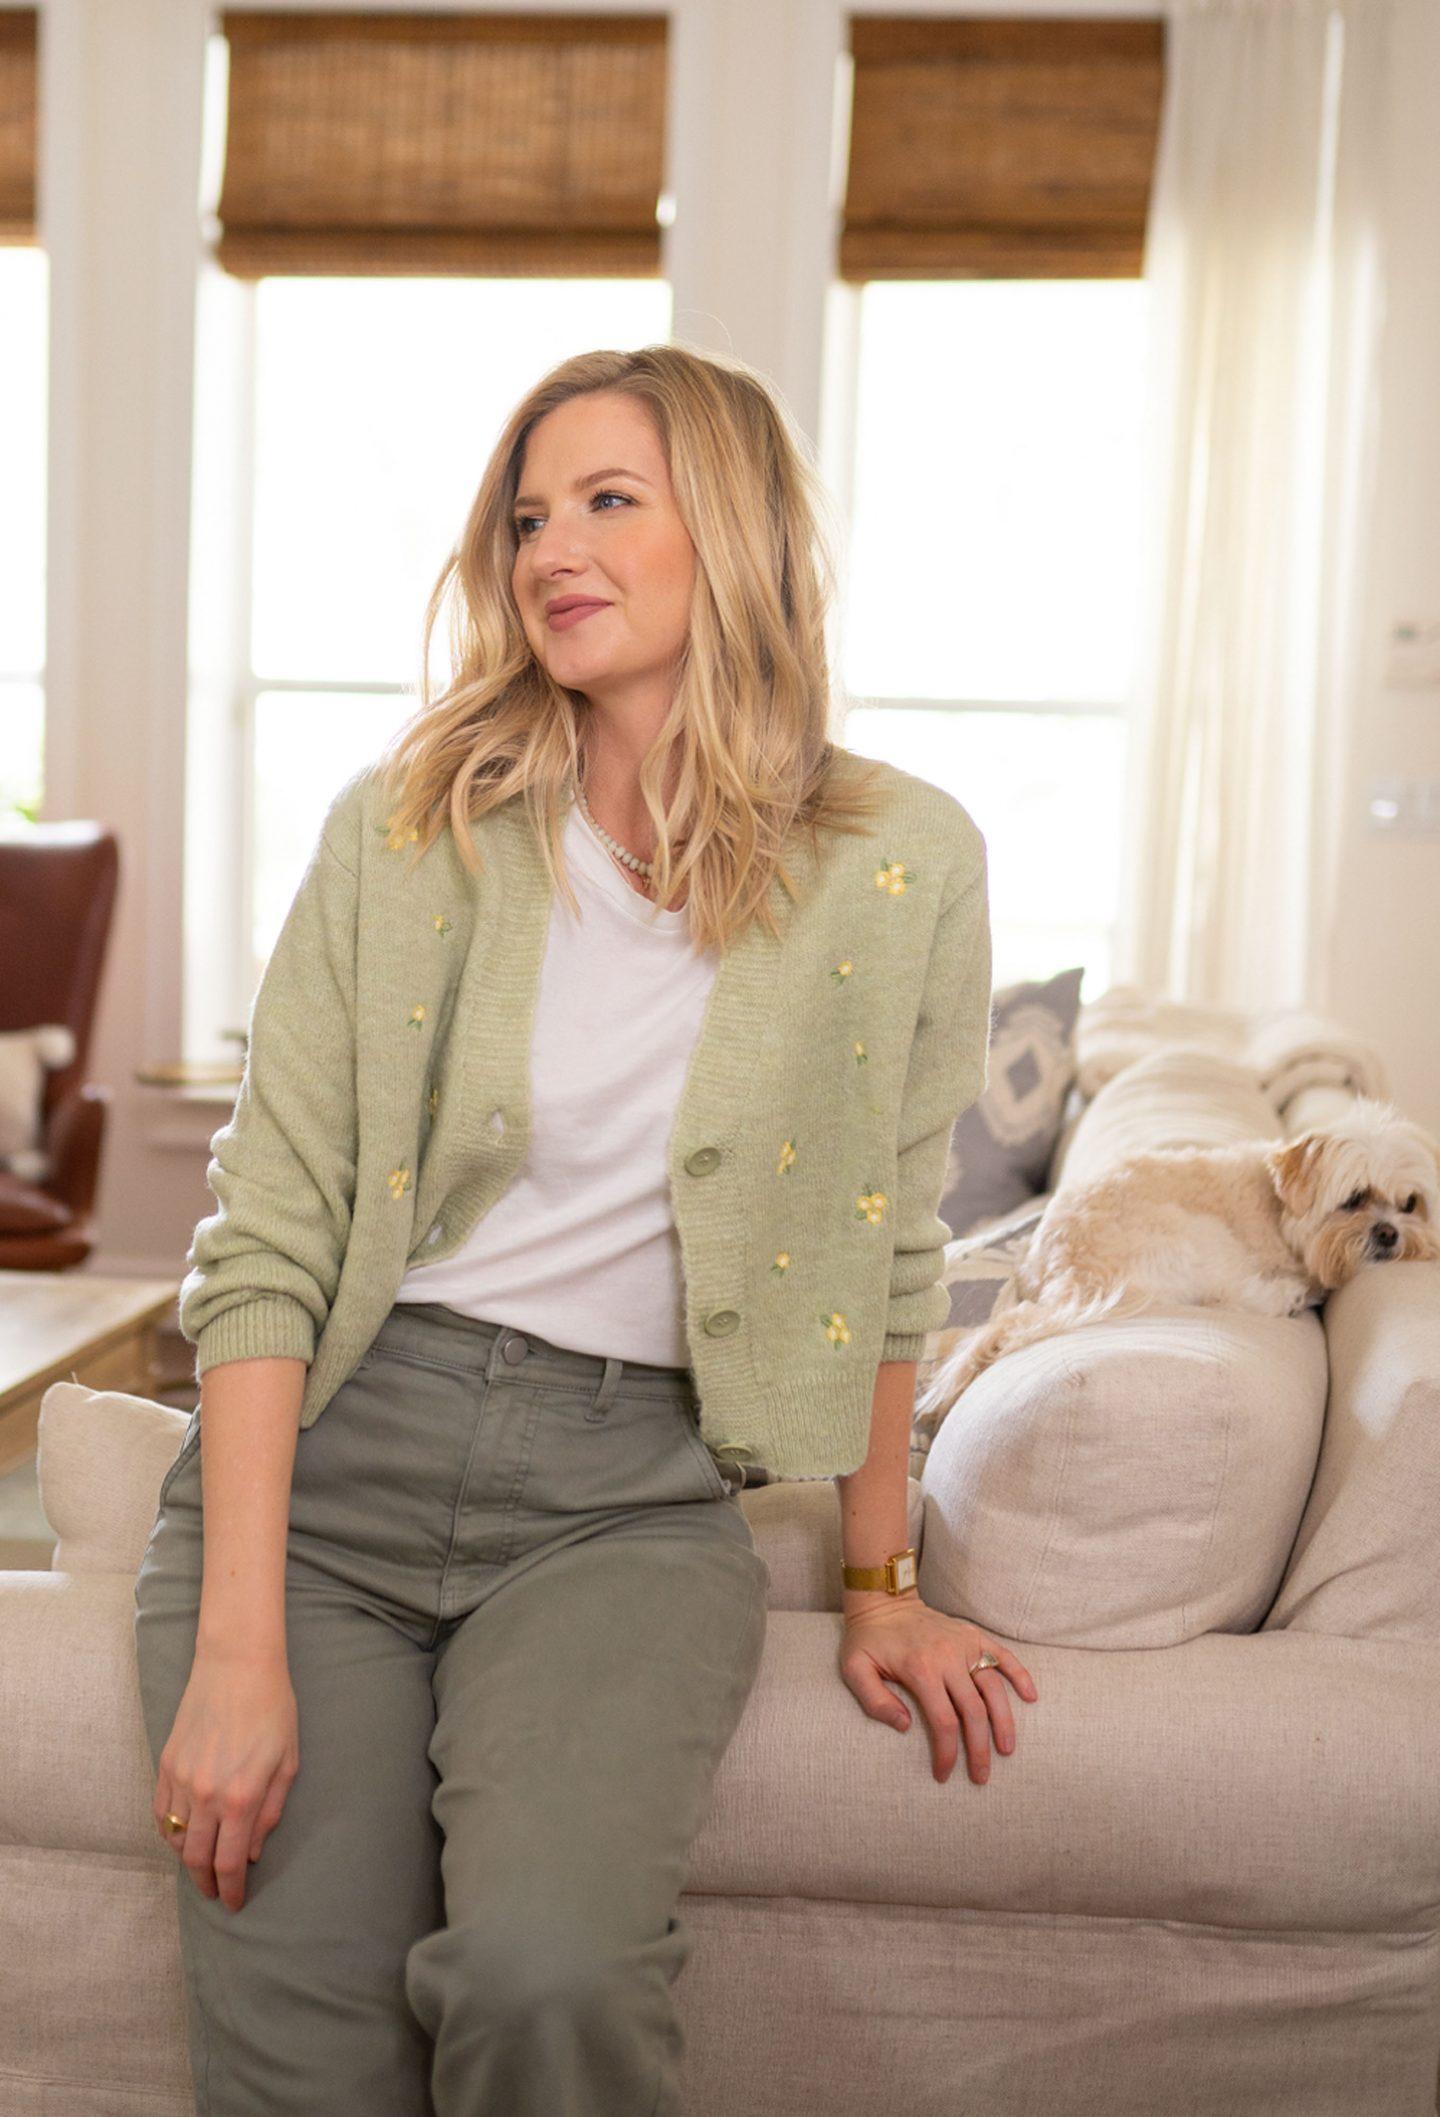 Ashley Brooke wearing a daisy floral cardigan sweater